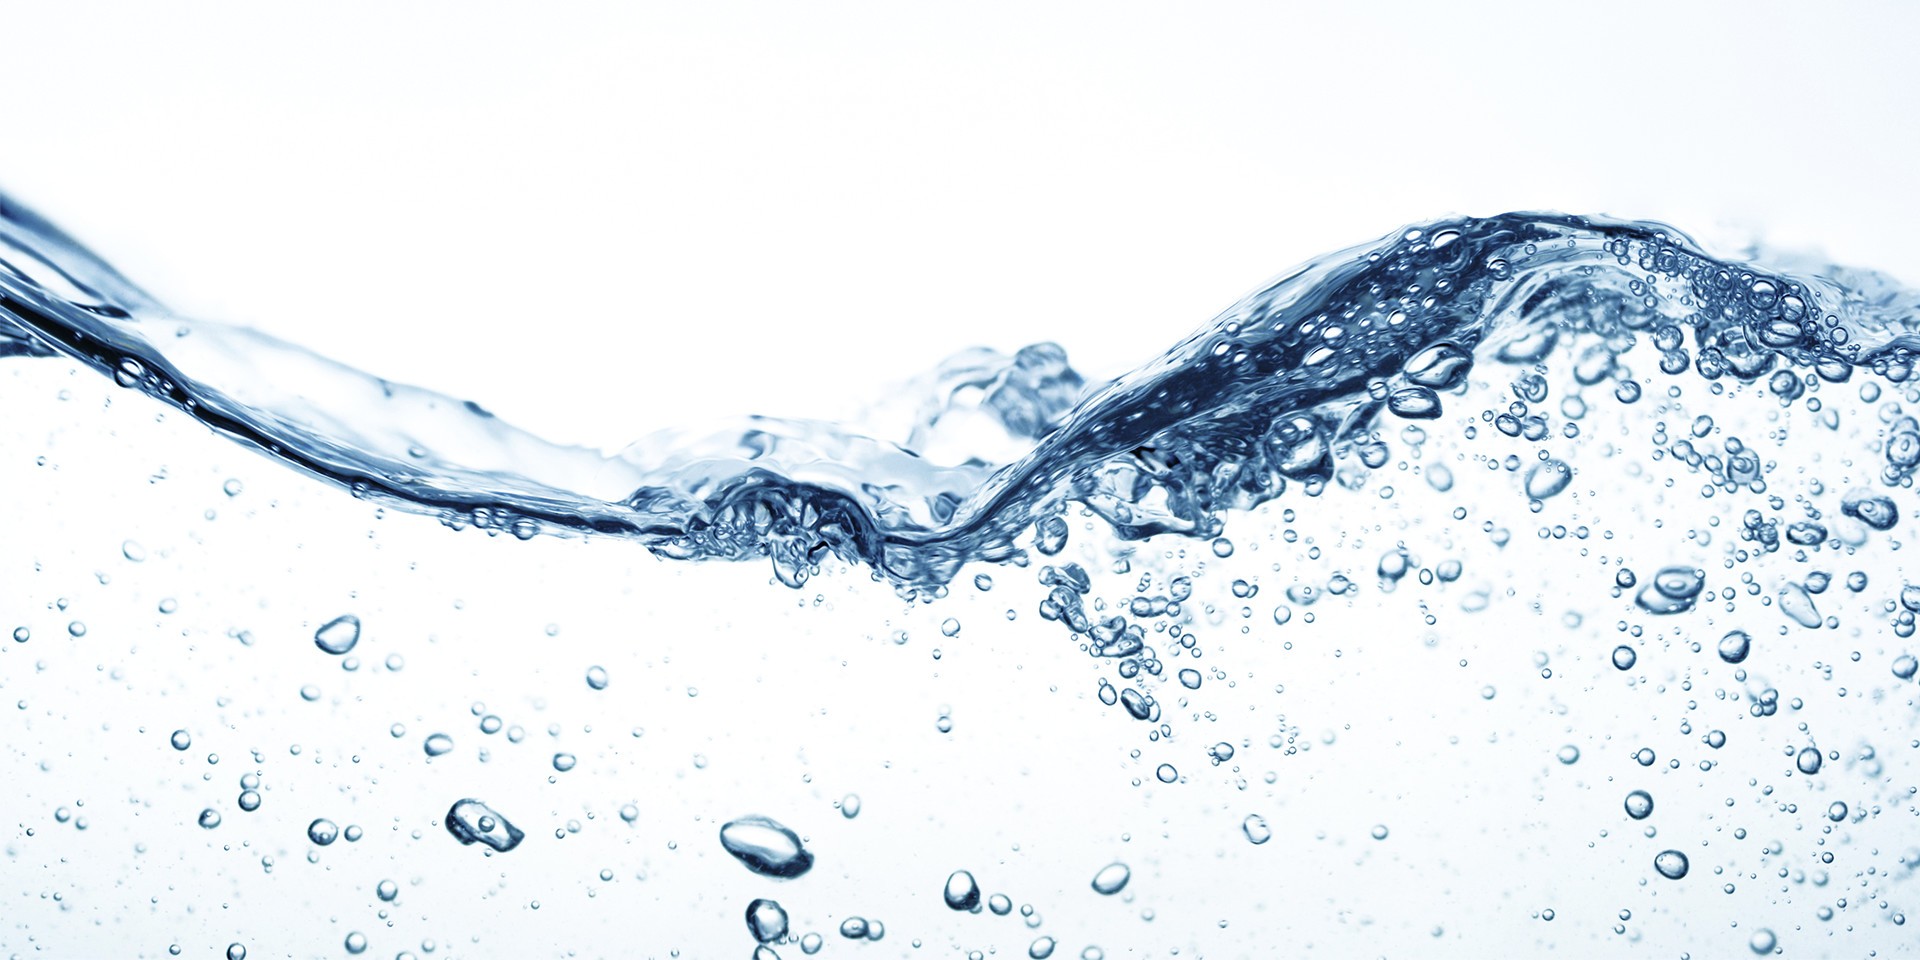 Textura agua